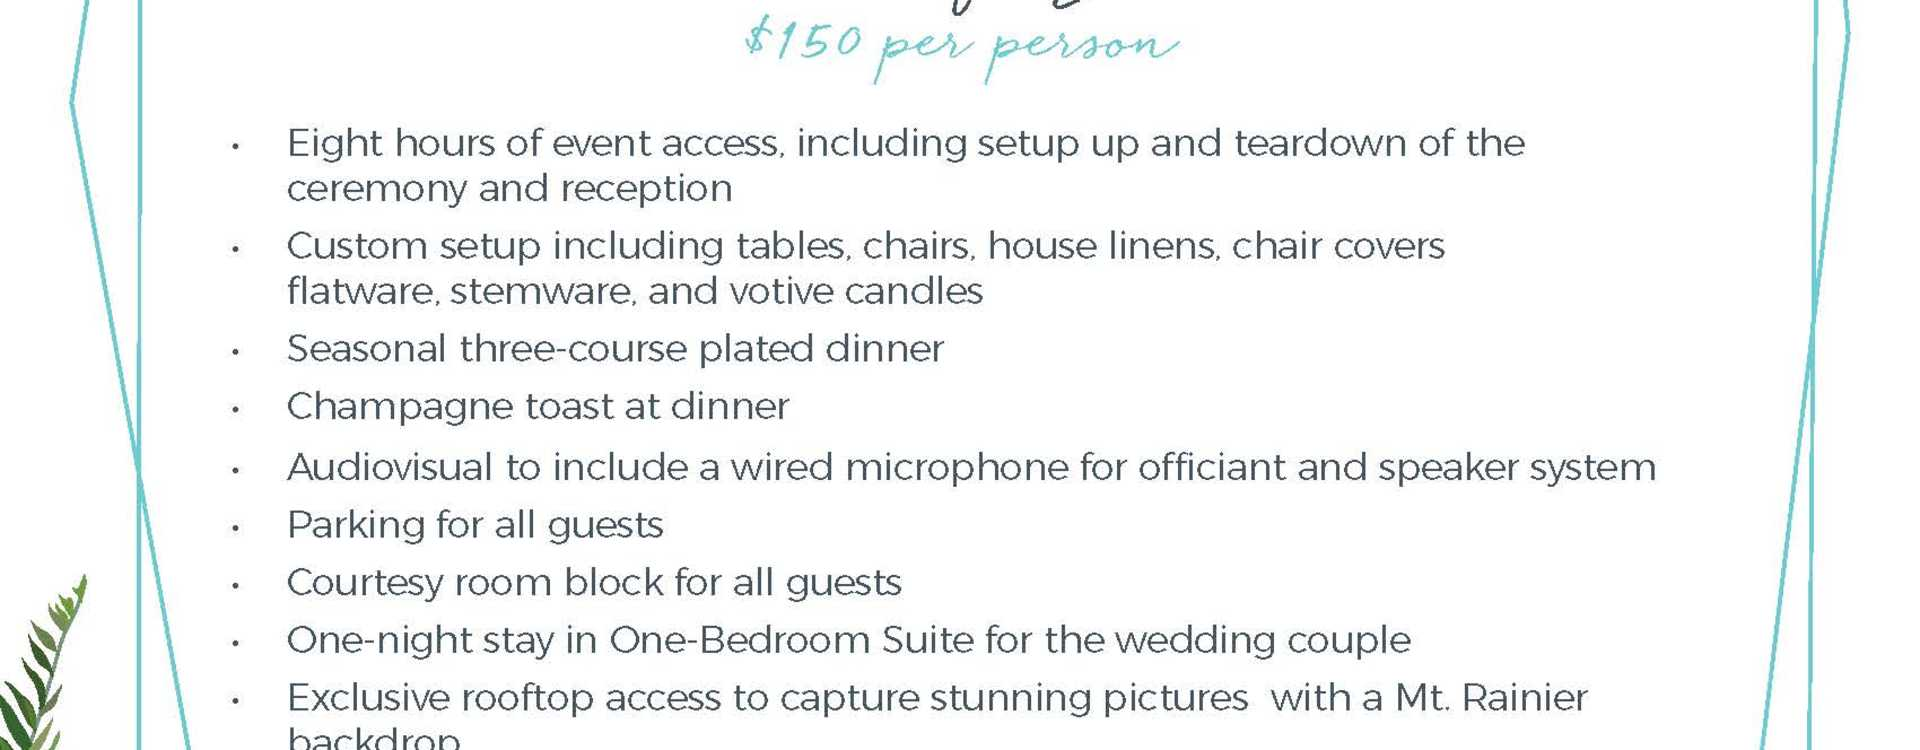 Hotel Interurban Celebrate Small Something Grand Wedding